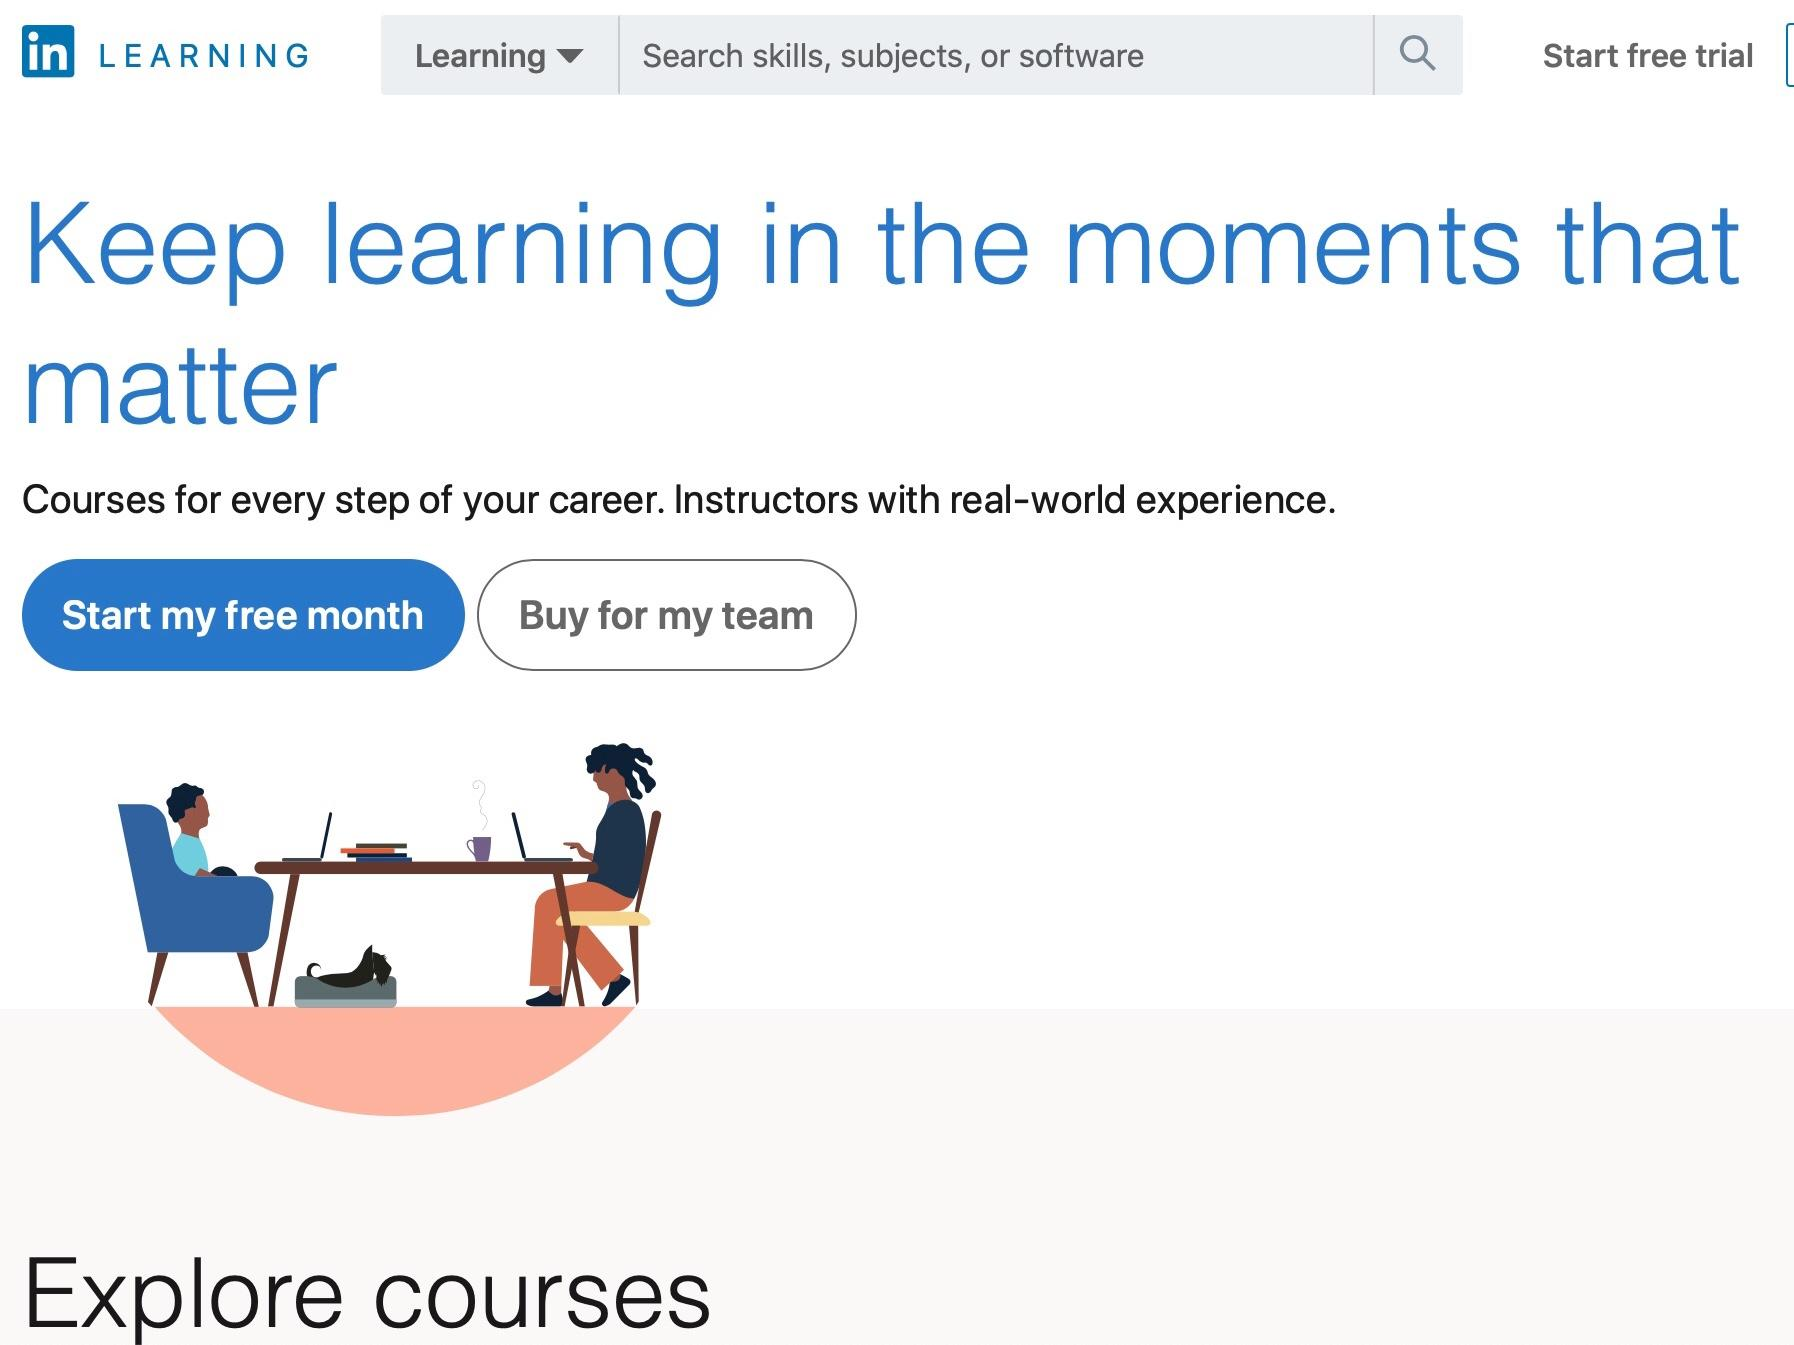 linkedin-learning-credit-linkedin-learning.jpg